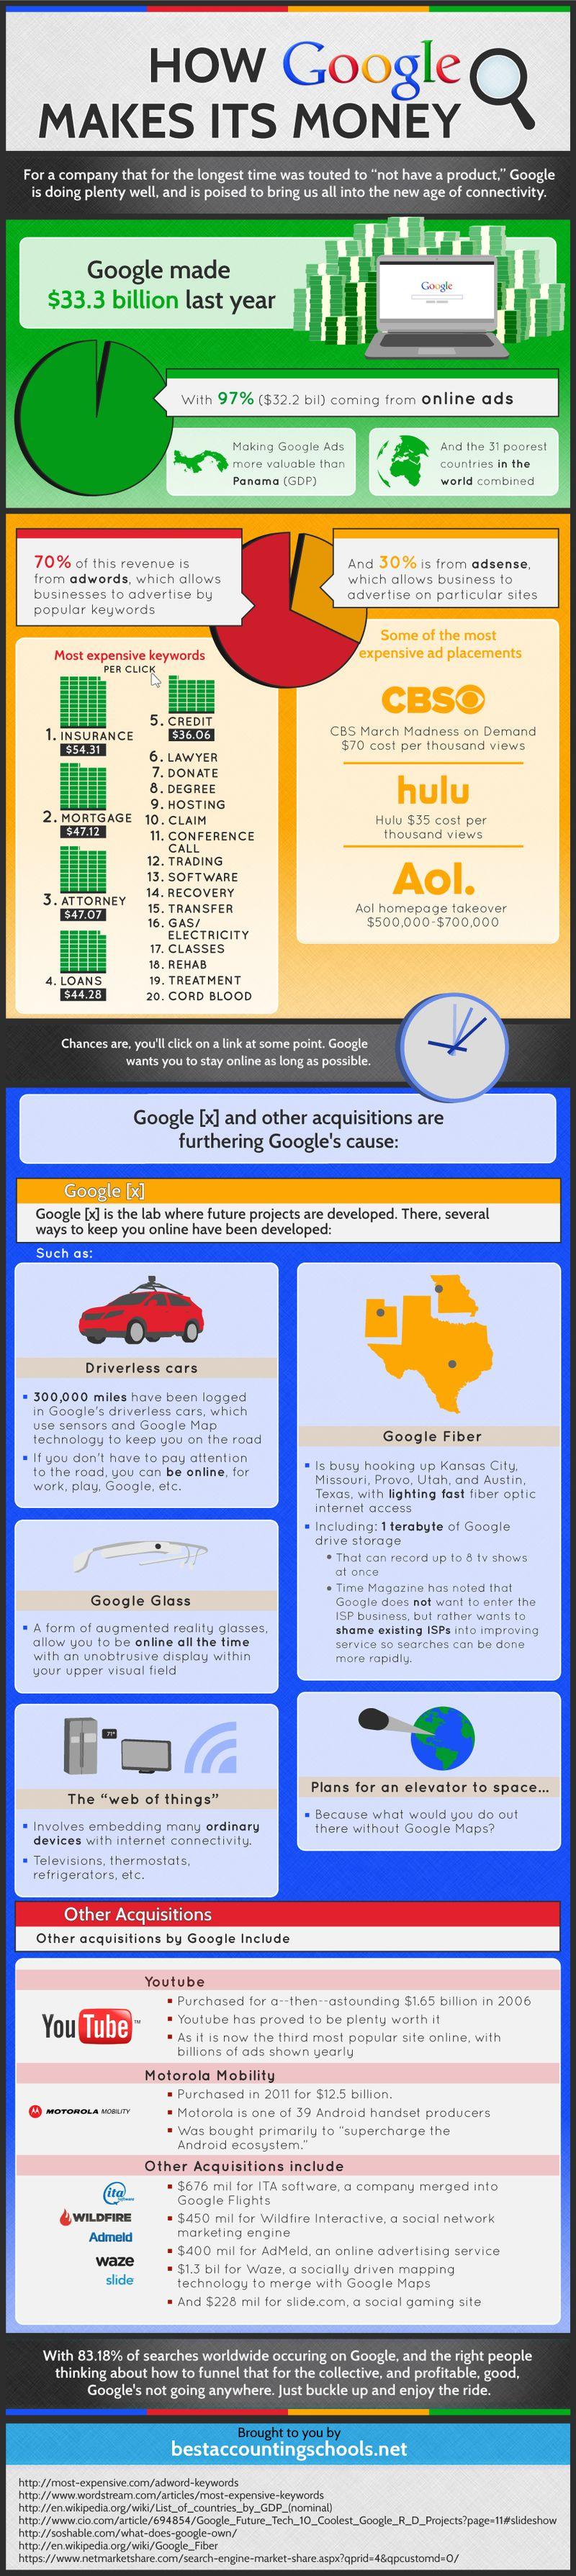 How-google-makes-its-money